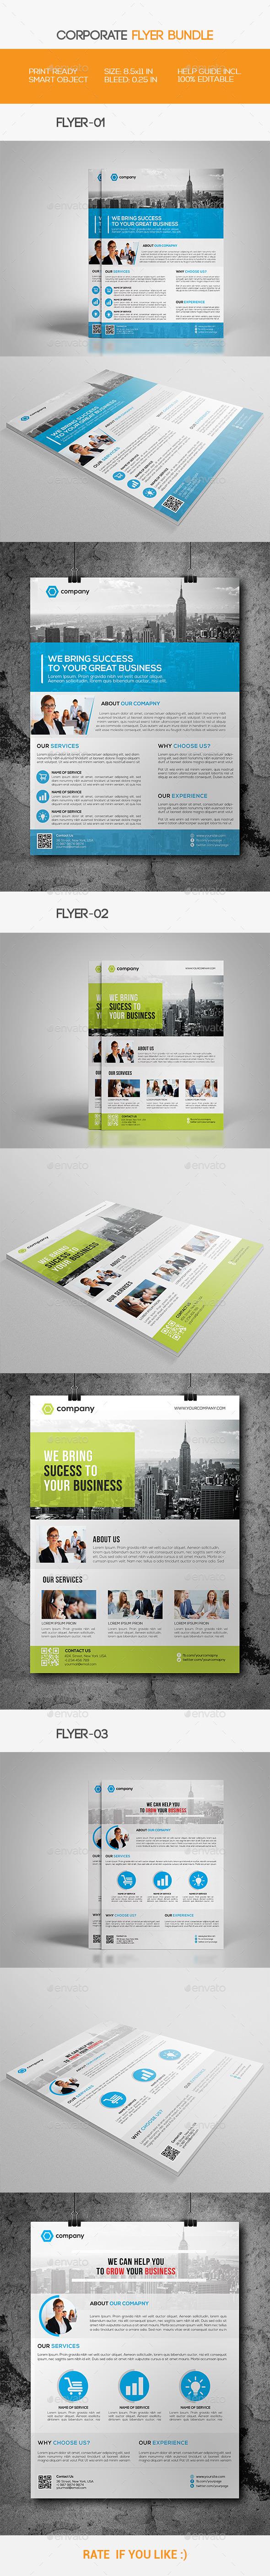 GraphicRiver Corporate Flyer Bundle 11454690